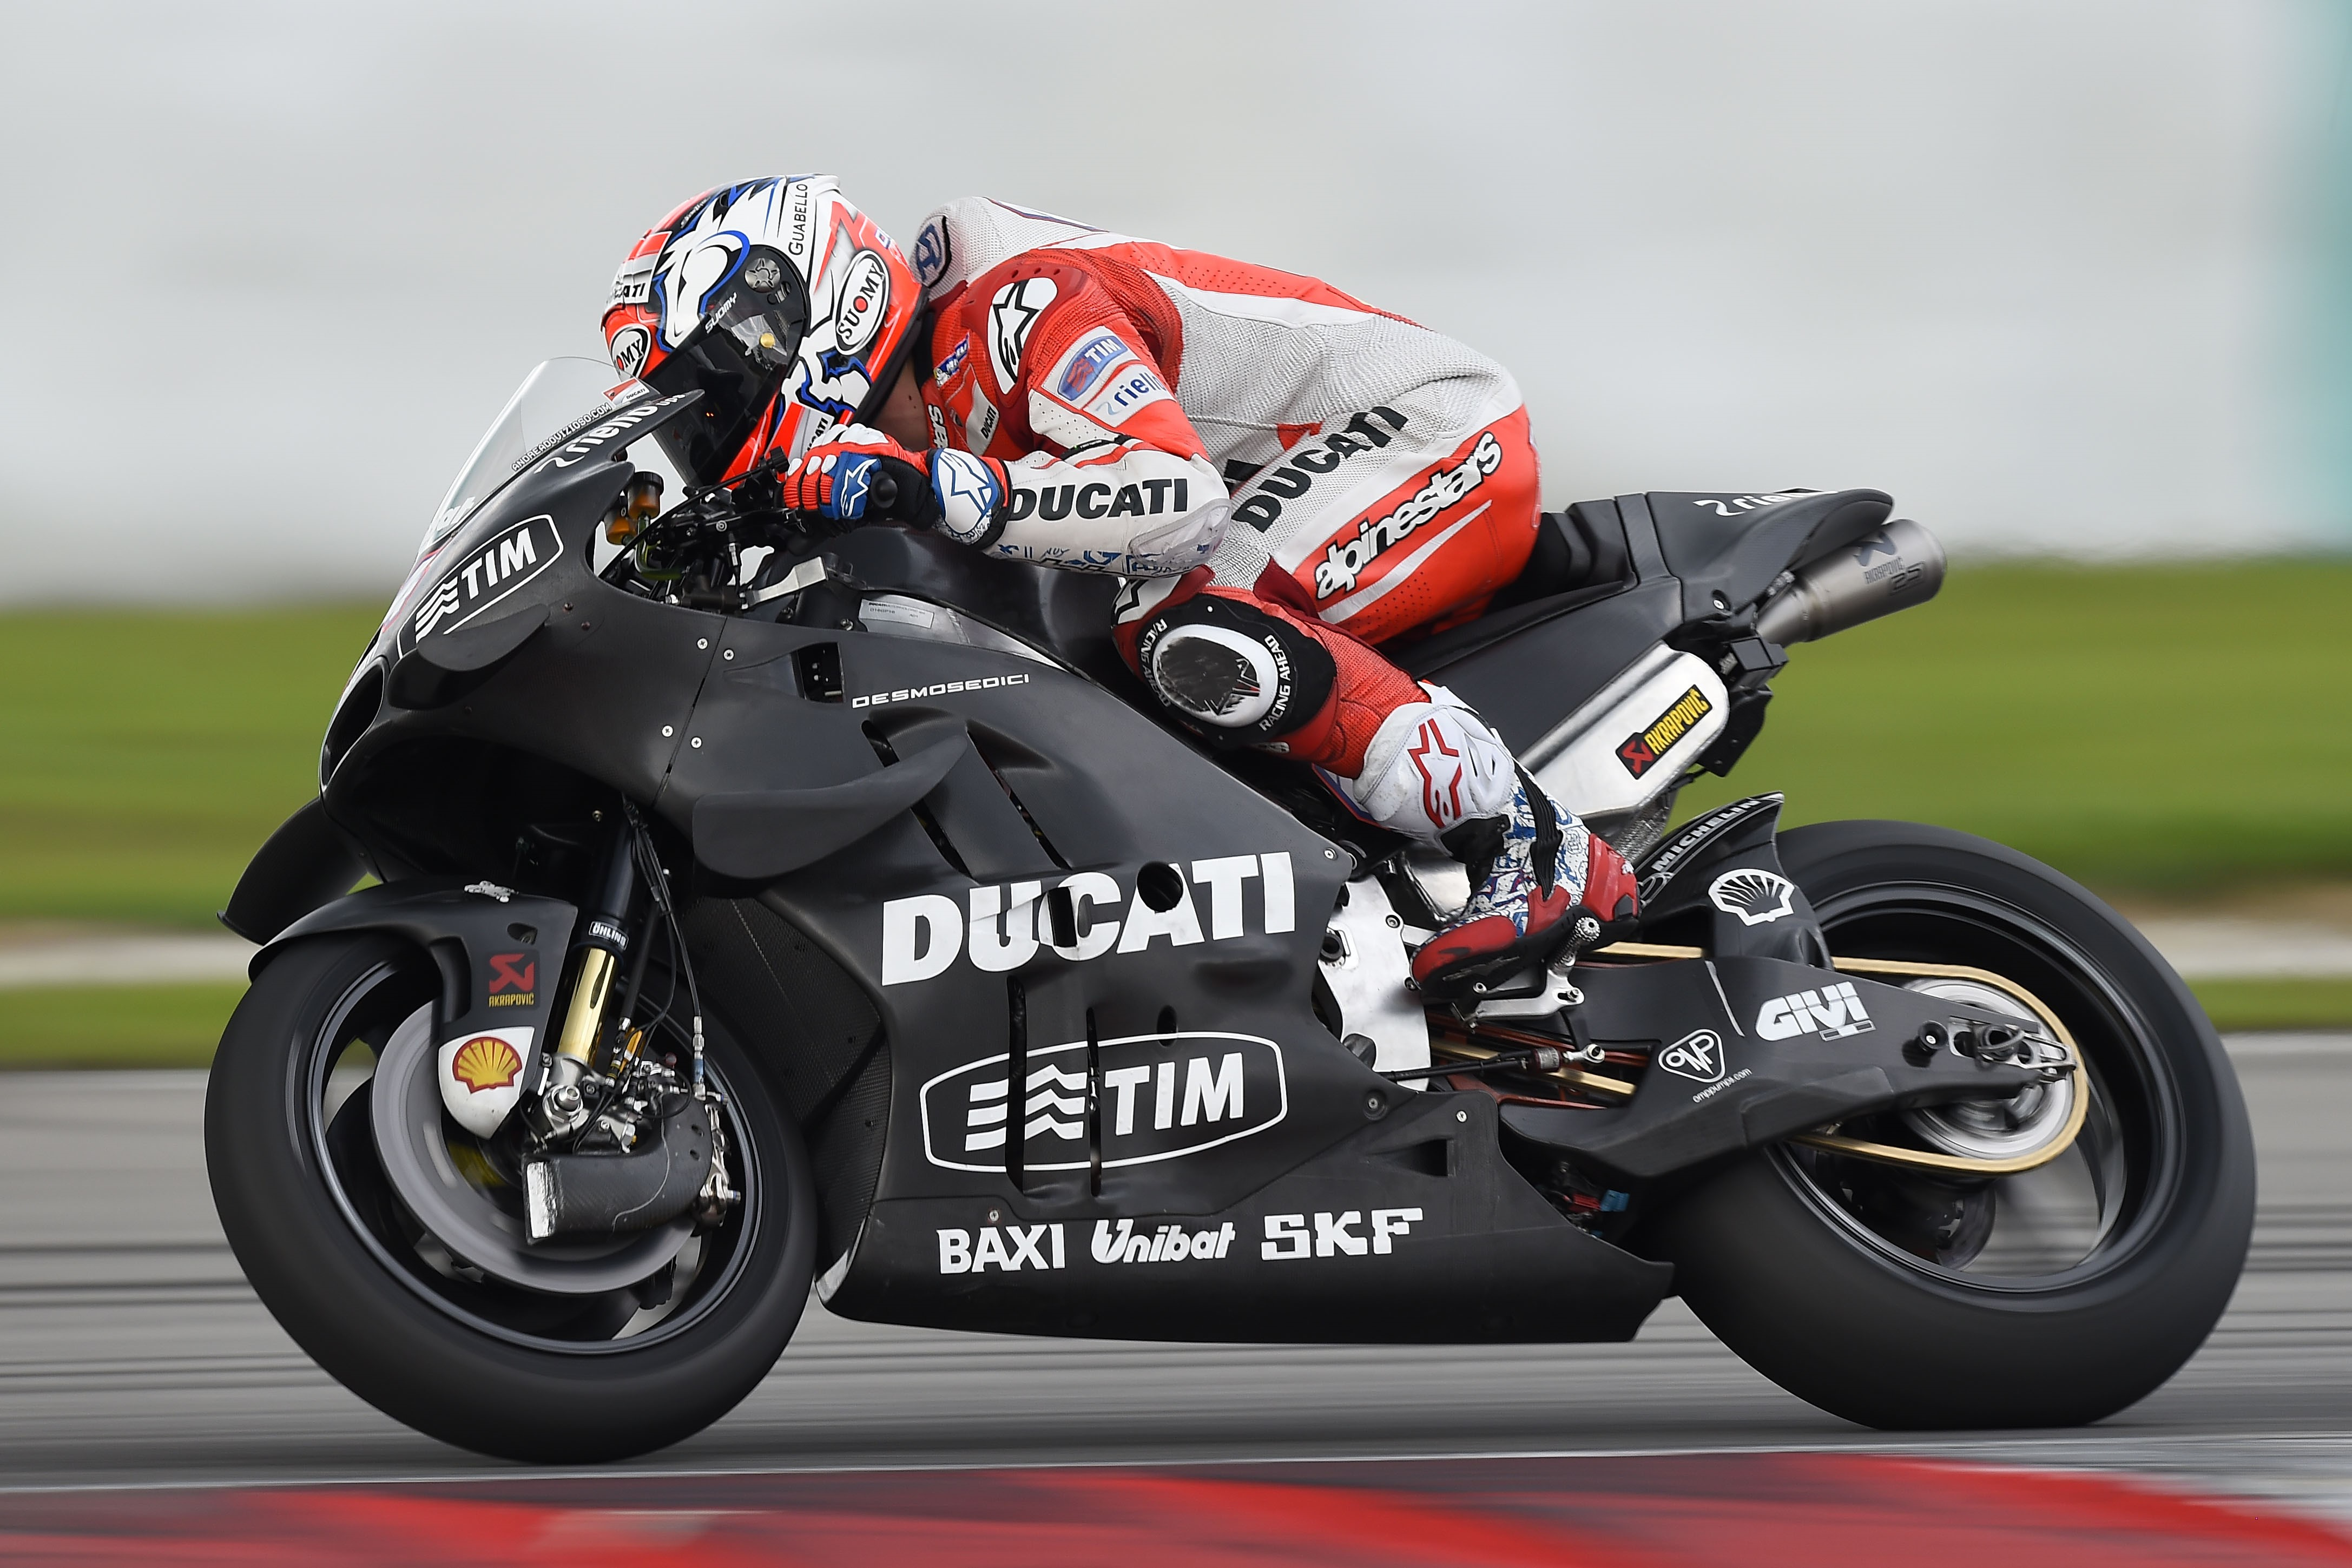 Andrea Dovizioso (Ducati Team) Jorge Lorenzo (Yamaha Factory) lors des tests de Sepang 1 2016